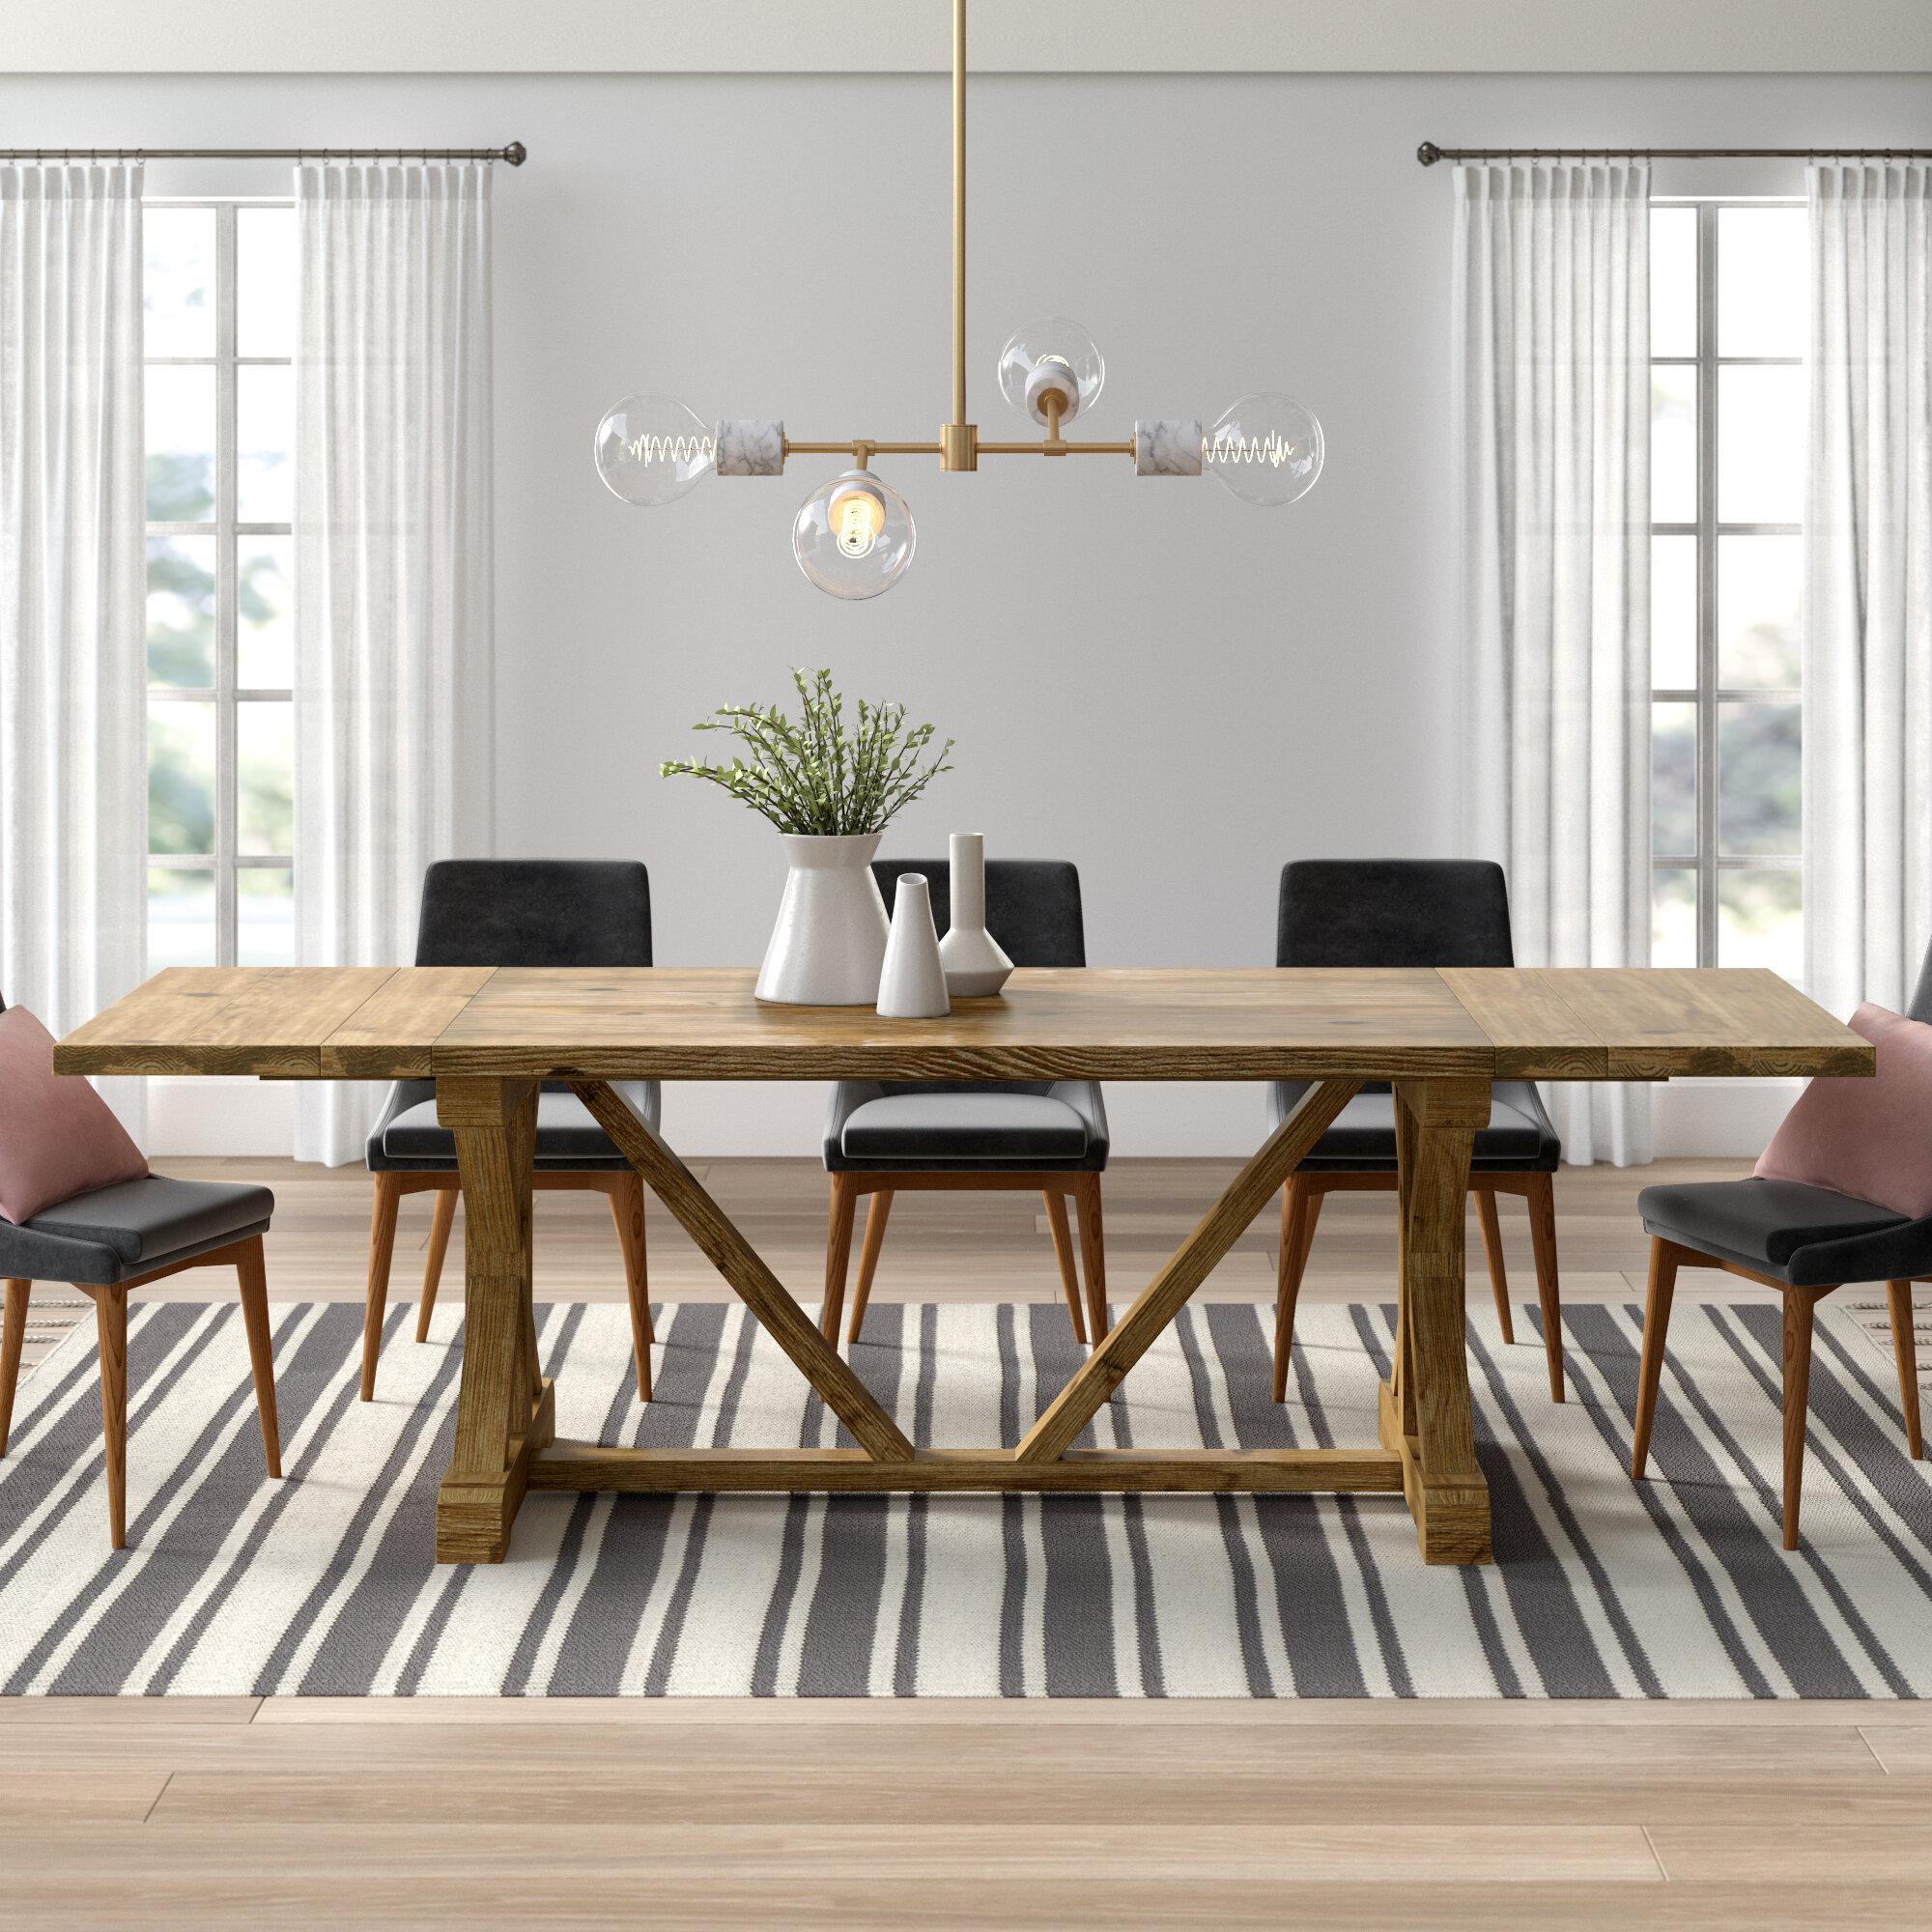 Excellent Camden Den Extendable Solid Wood Dining Table Machost Co Dining Chair Design Ideas Machostcouk